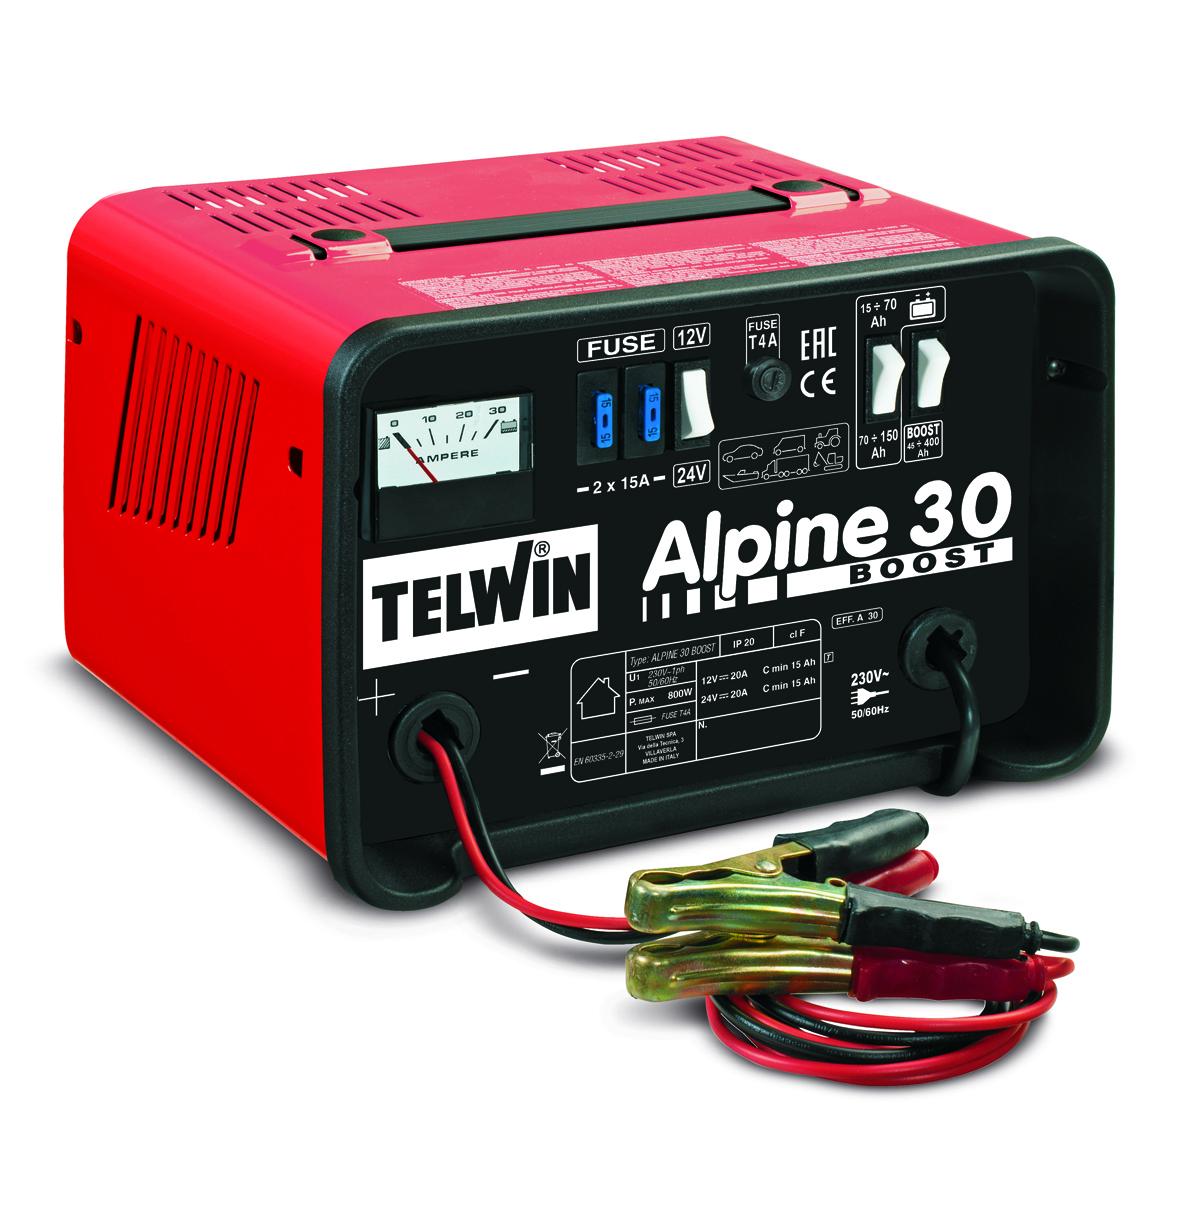 Зарядное устройство автомобильное TELWIN ALPINE 30 BOOST 12-24В